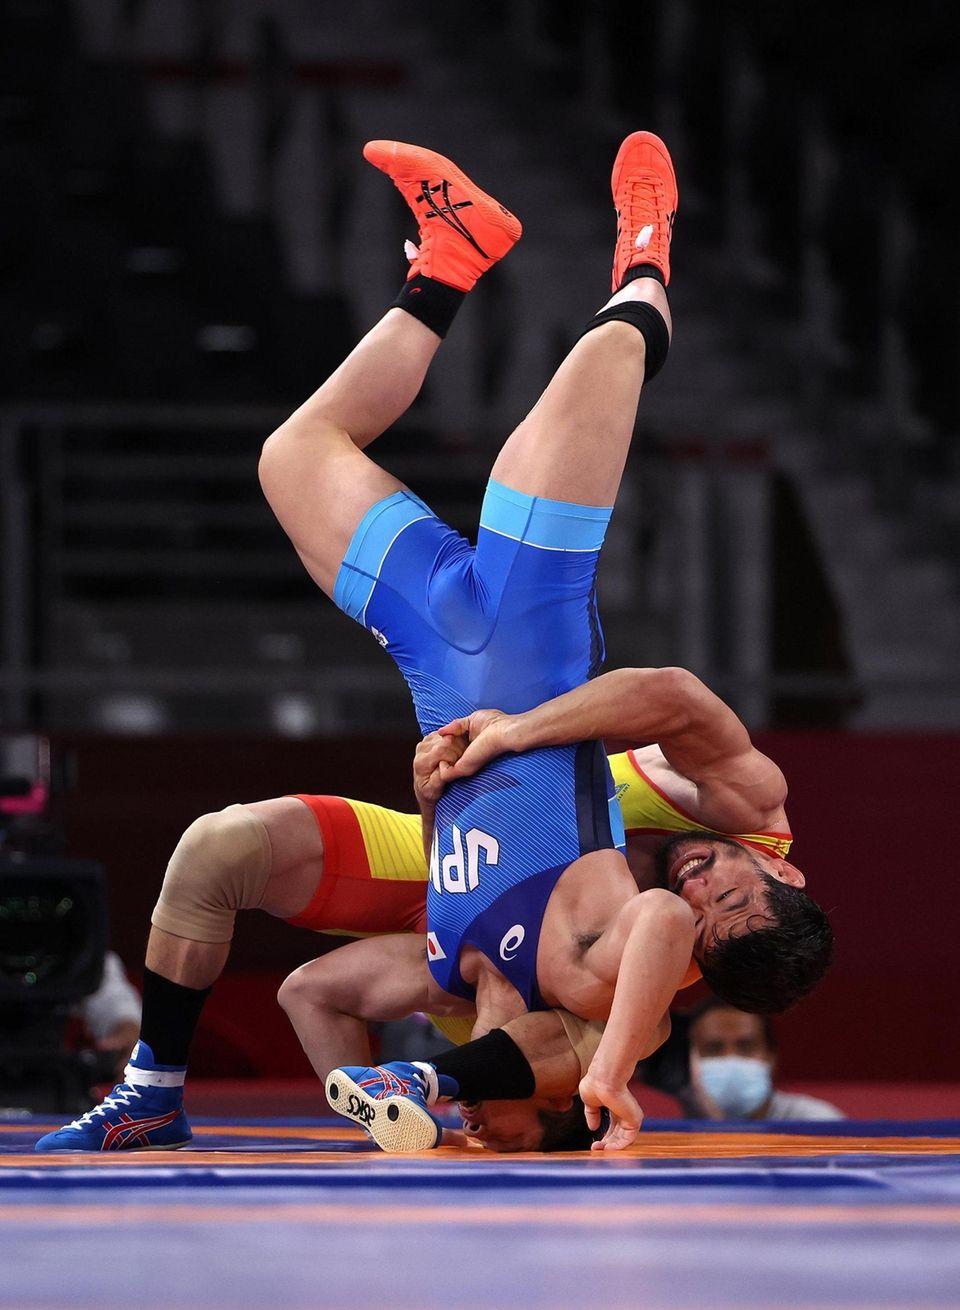 Demeu Zhadrayev of Team Kazakhstan competes against Shohei